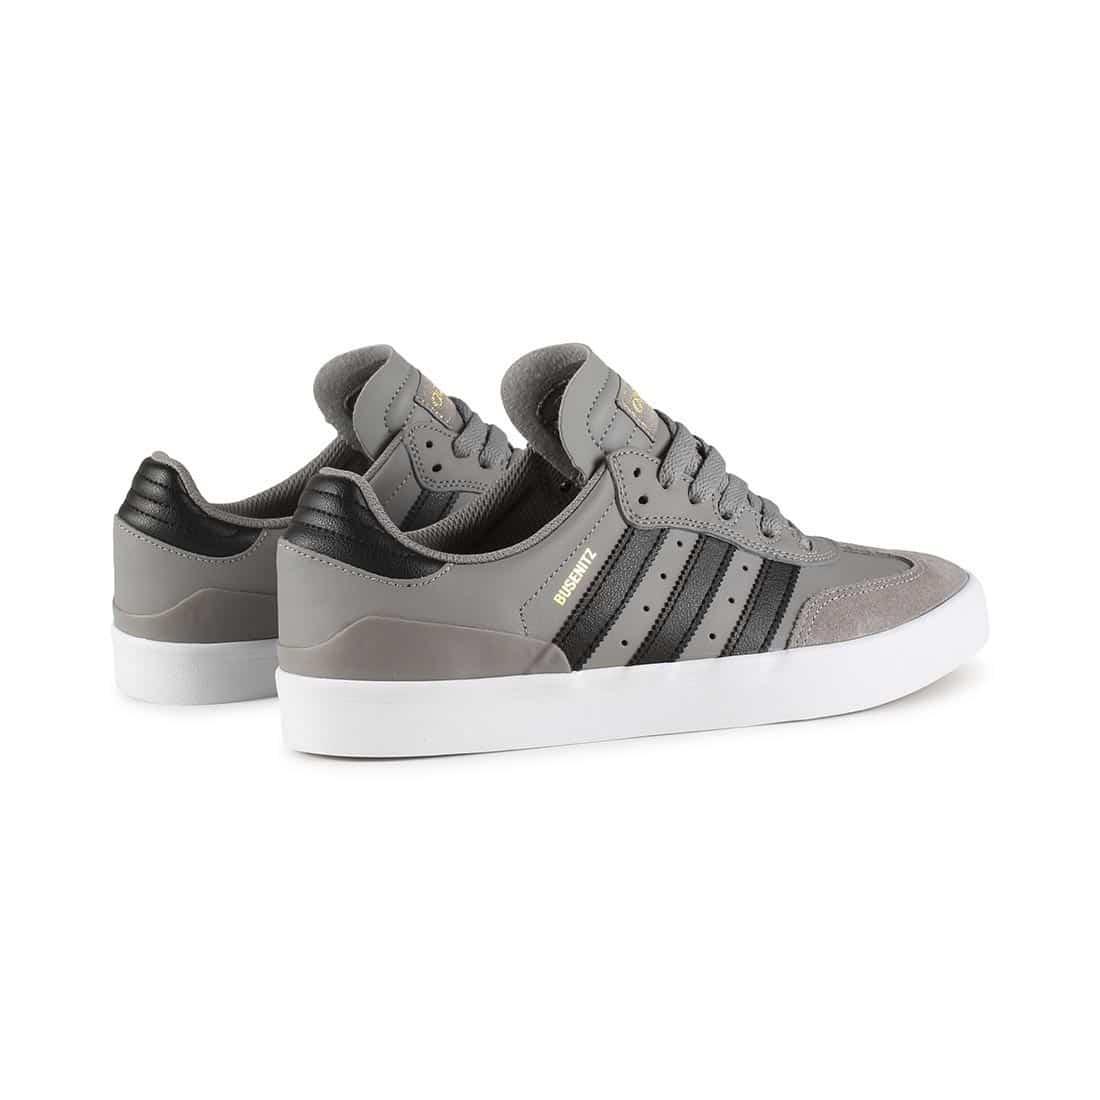 Adidas Busenitz Vulc Grey Black White